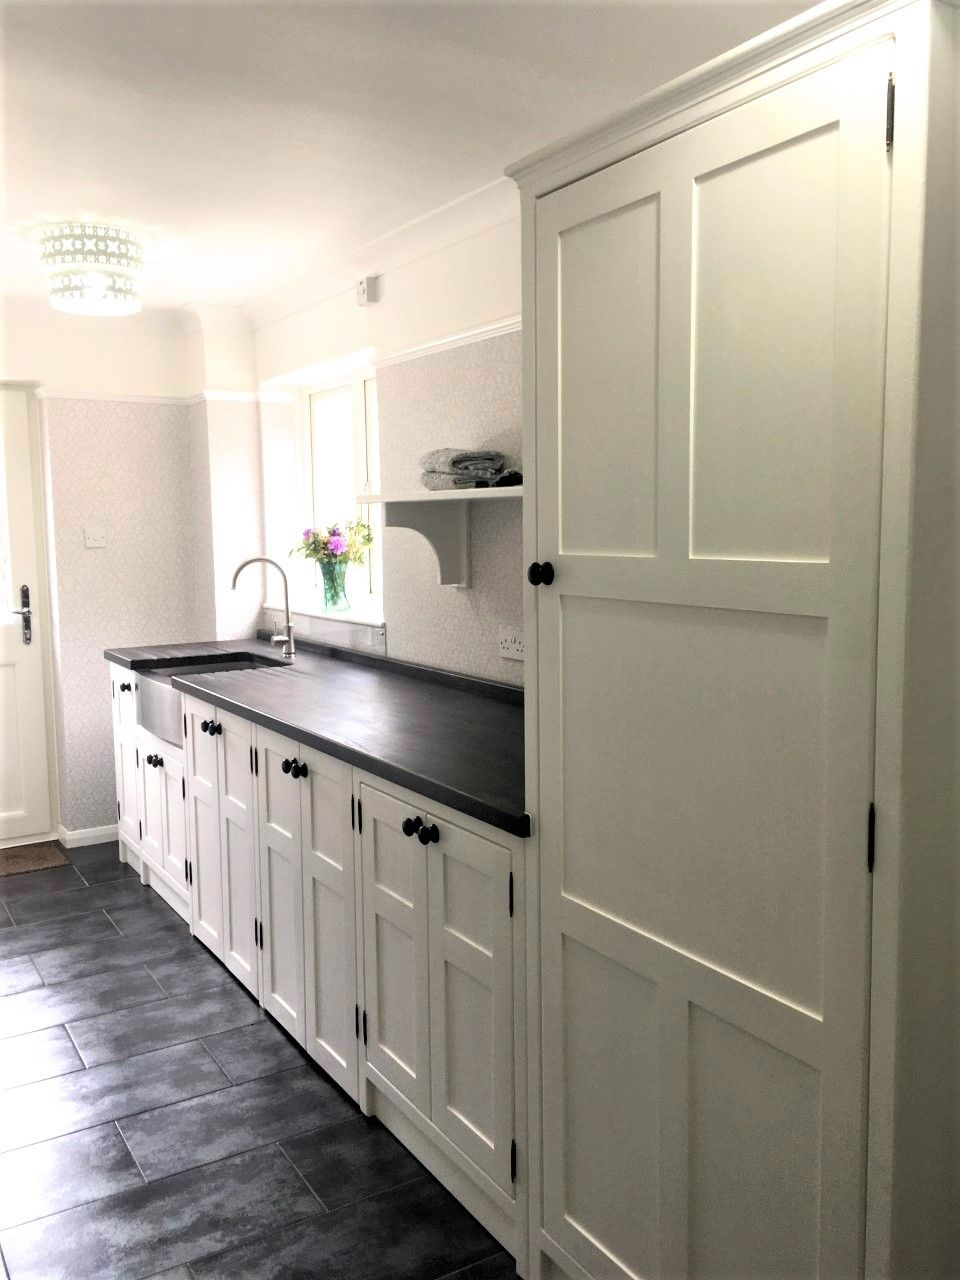 Utility Room Goals In 2020 Free Standing Kitchen Units Kitchen Units Larder Unit